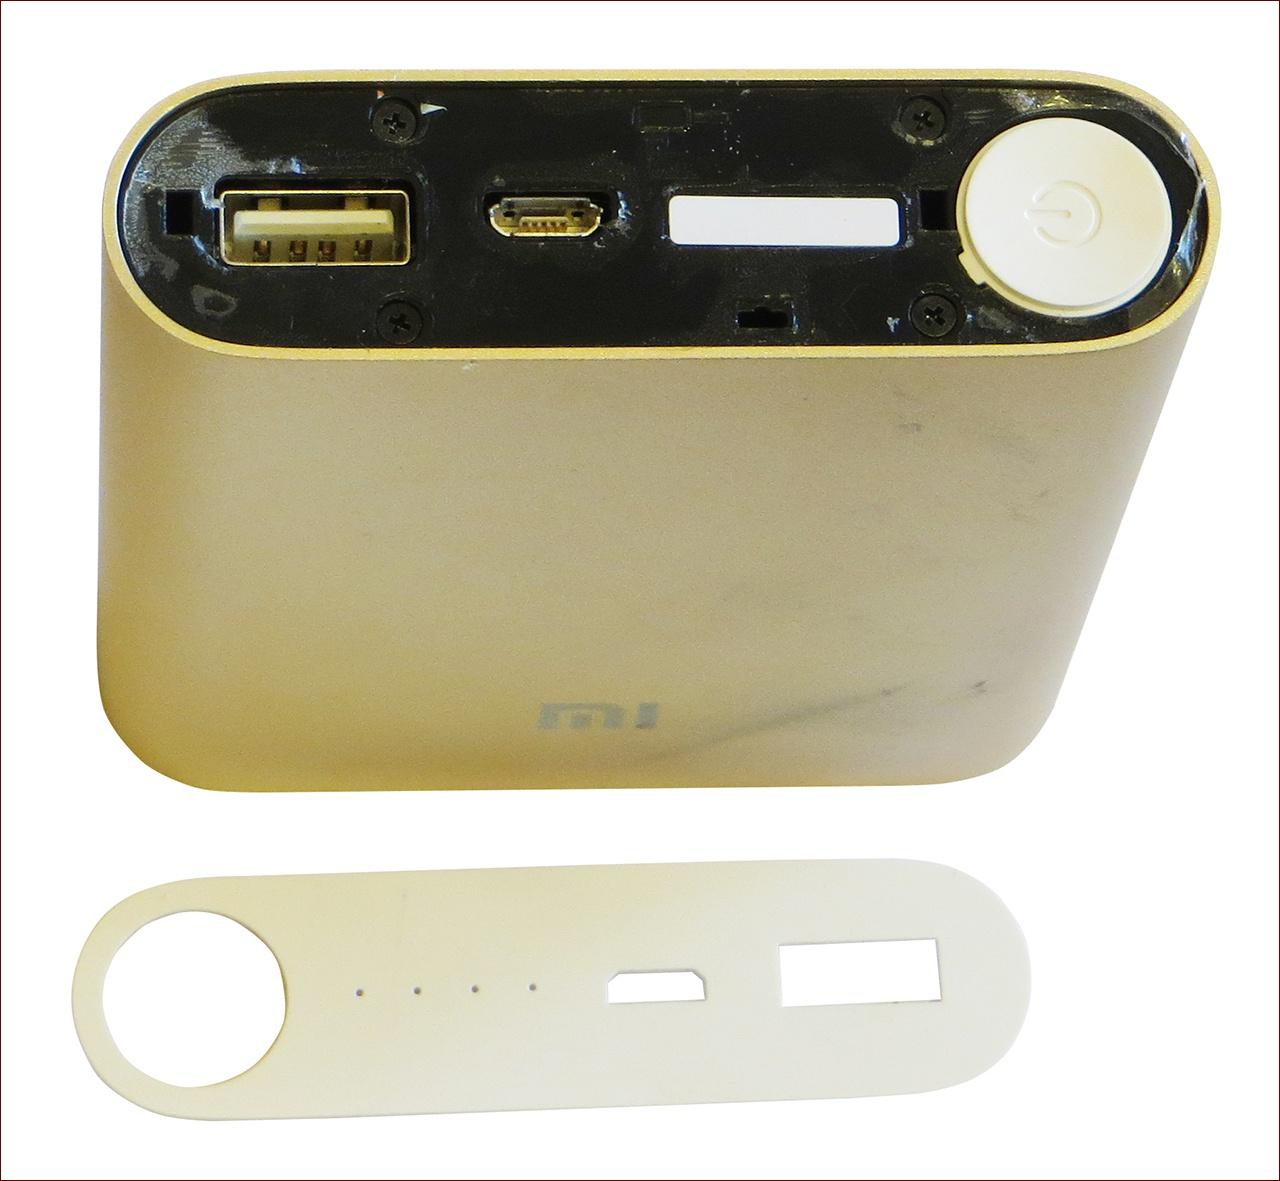 Внешние аккумуляторы HIPER и Xiaomi Mi — взгляд дилетанта - 49